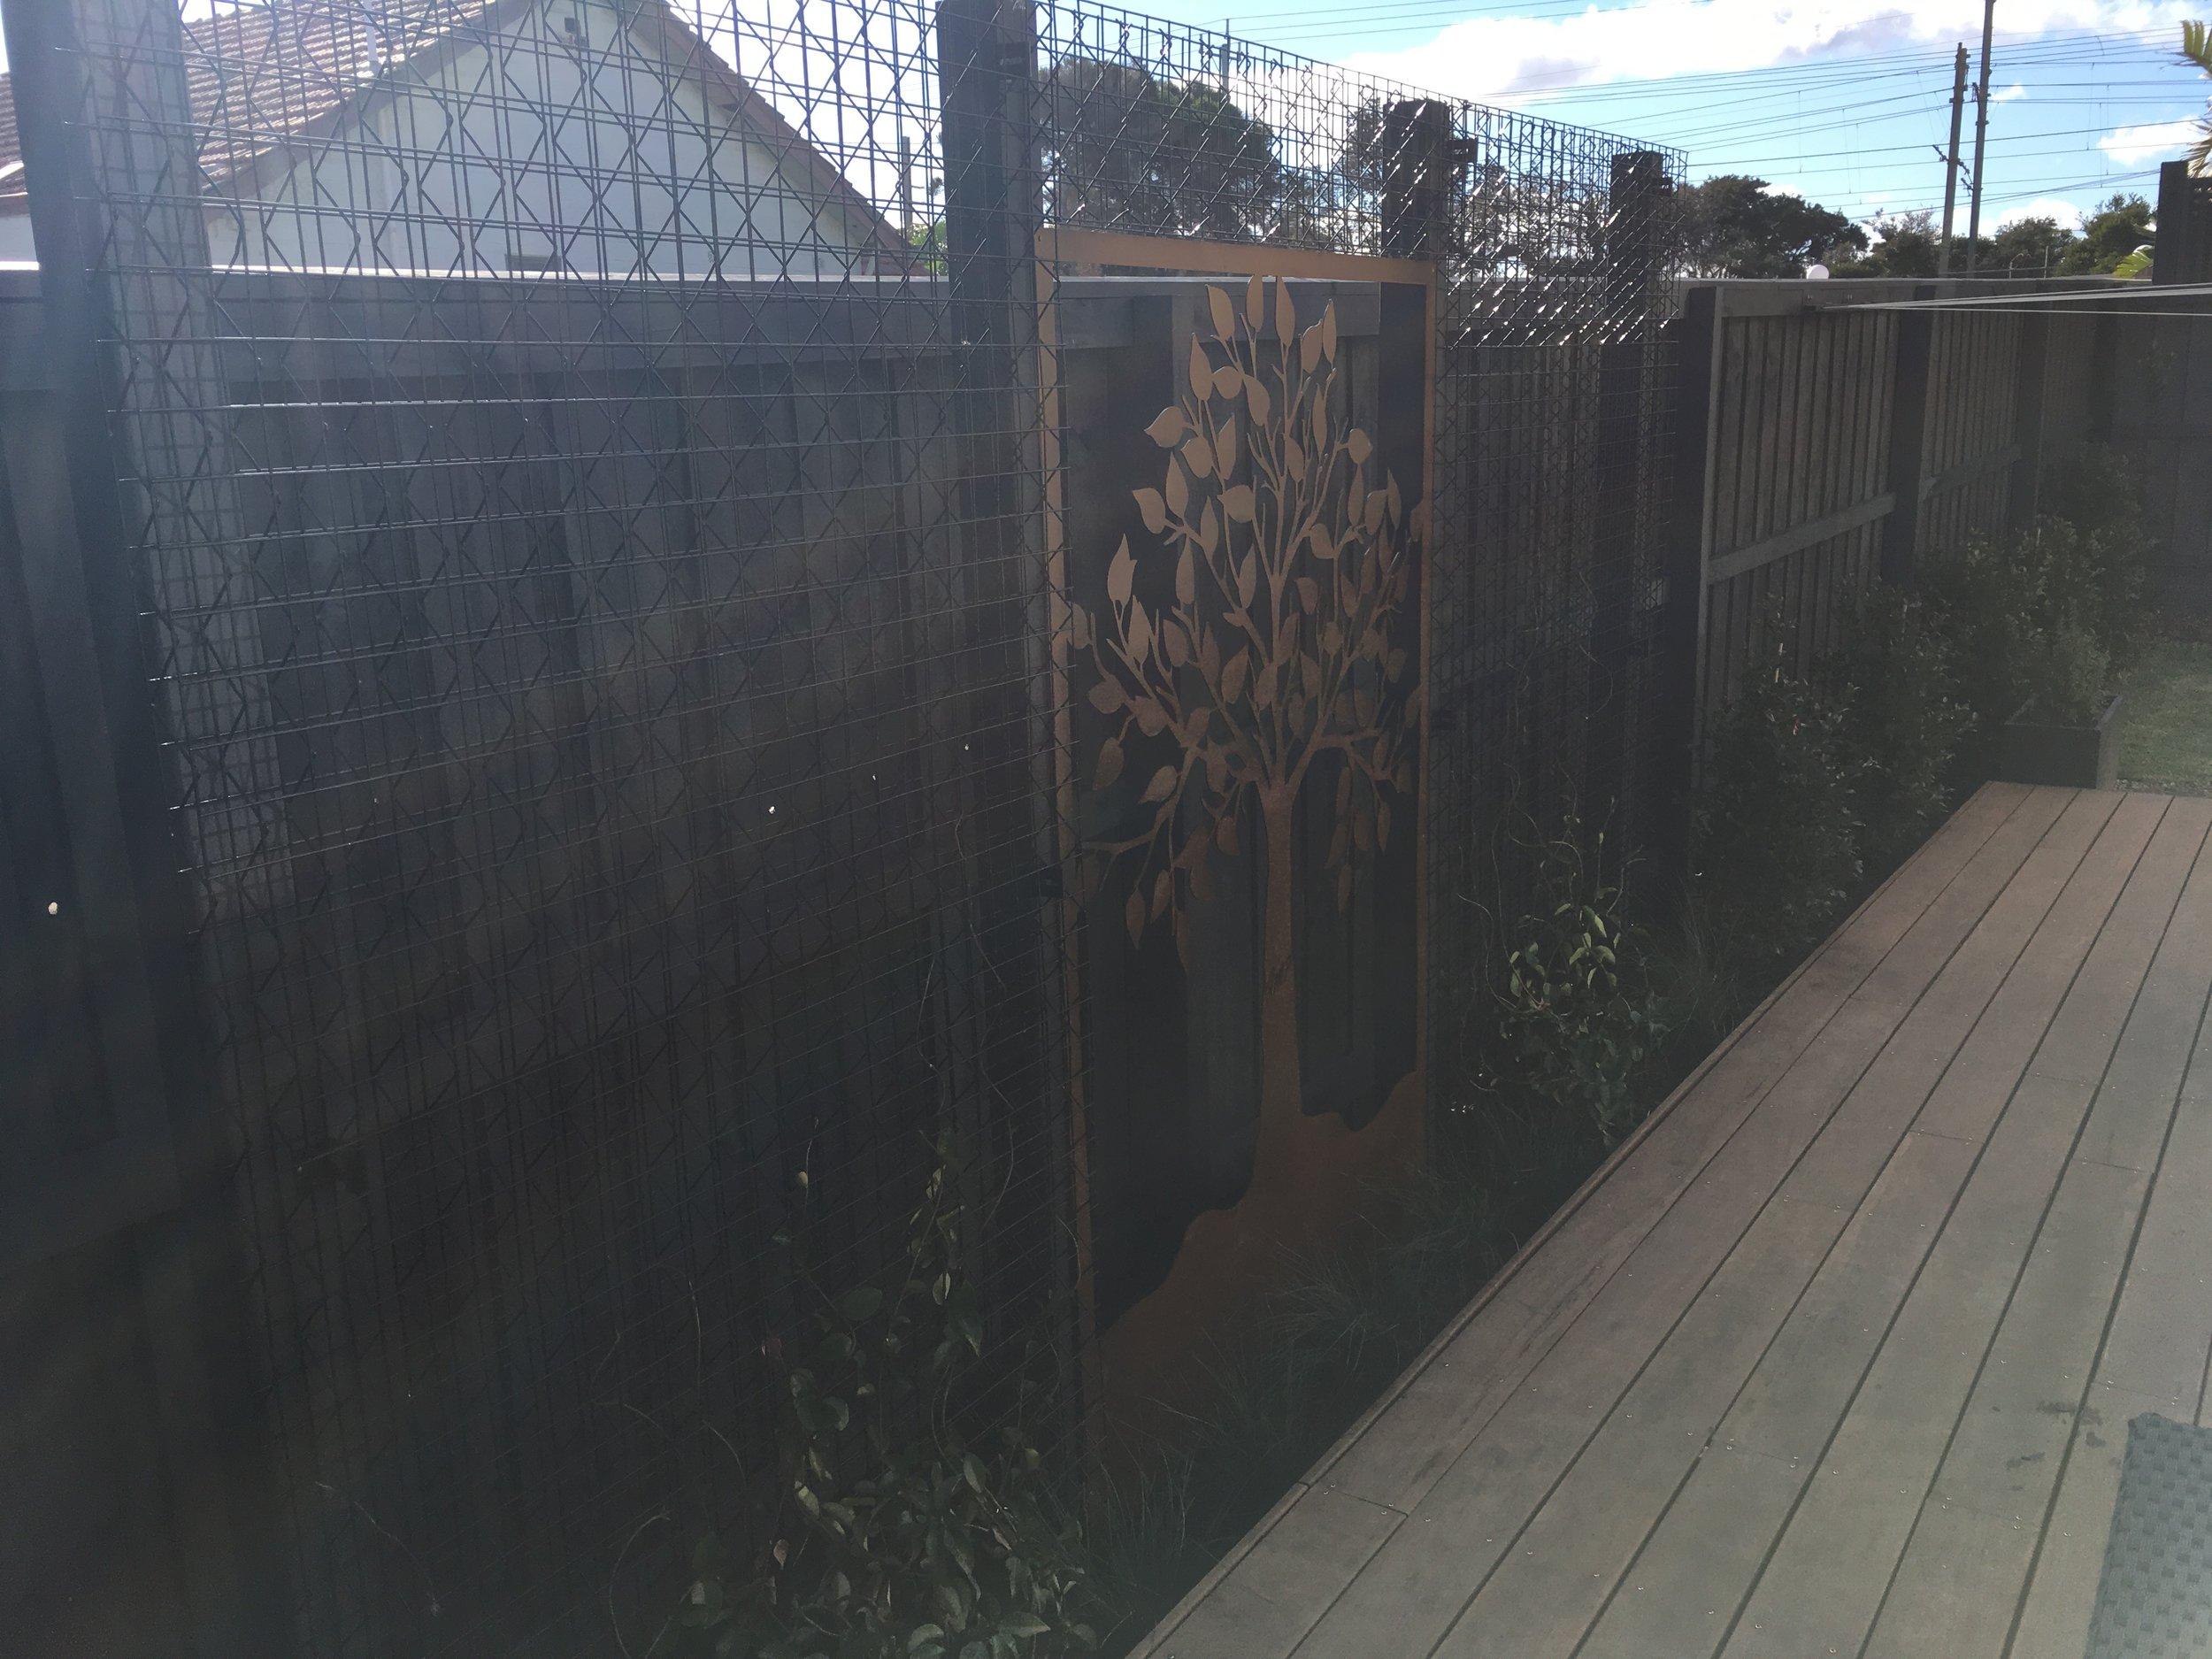 Seaford Courtyard/Garden. Entanglements Feature Screen. Archbar 3D Trellis. Syzygium australe, Lomandra 'Seascape'. Trachelospermum jasminoides 'Star Jasmine'. Merbau Decking.